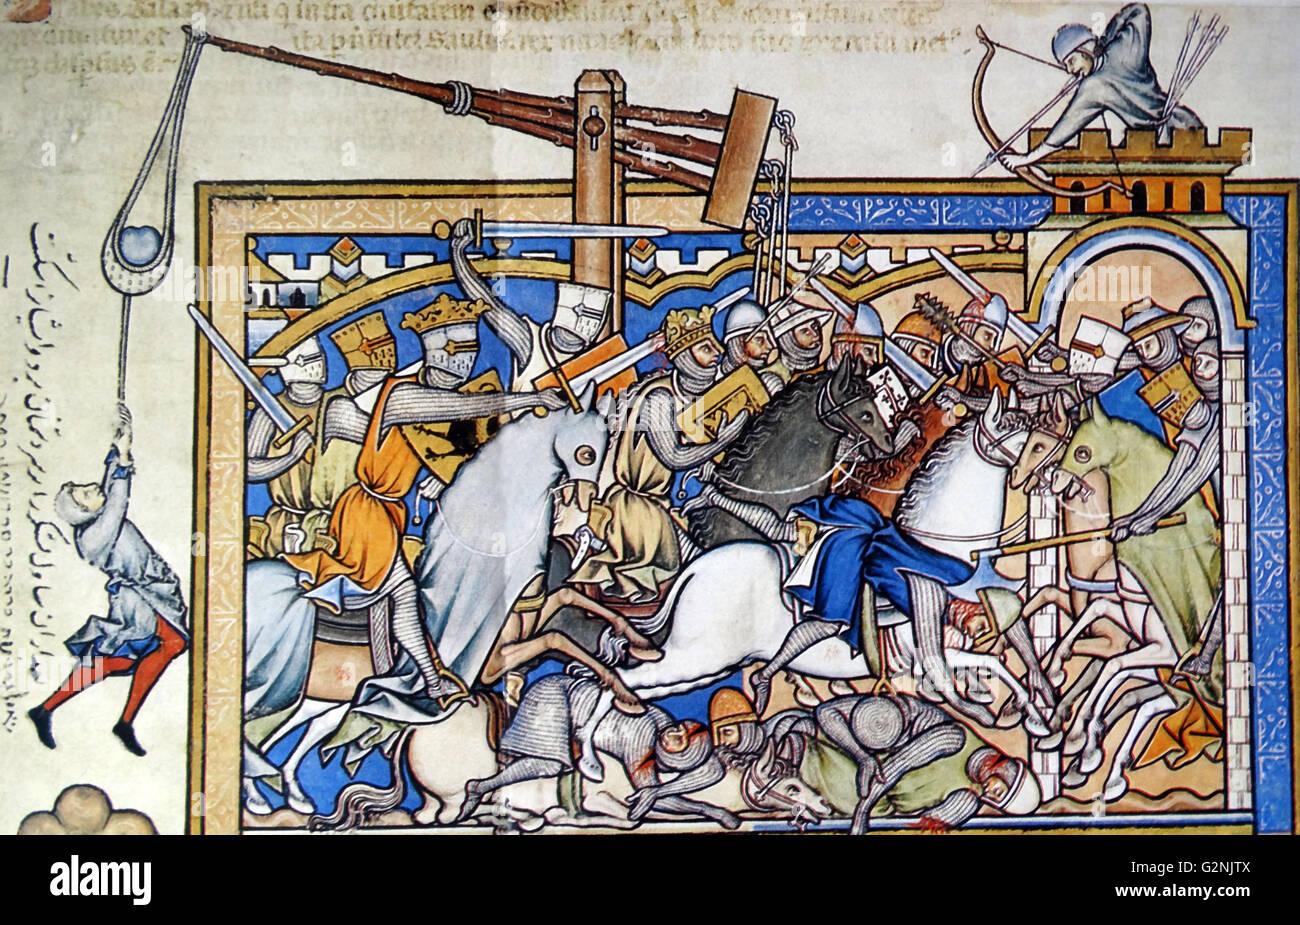 Mediaeval battle scene - Stock Image